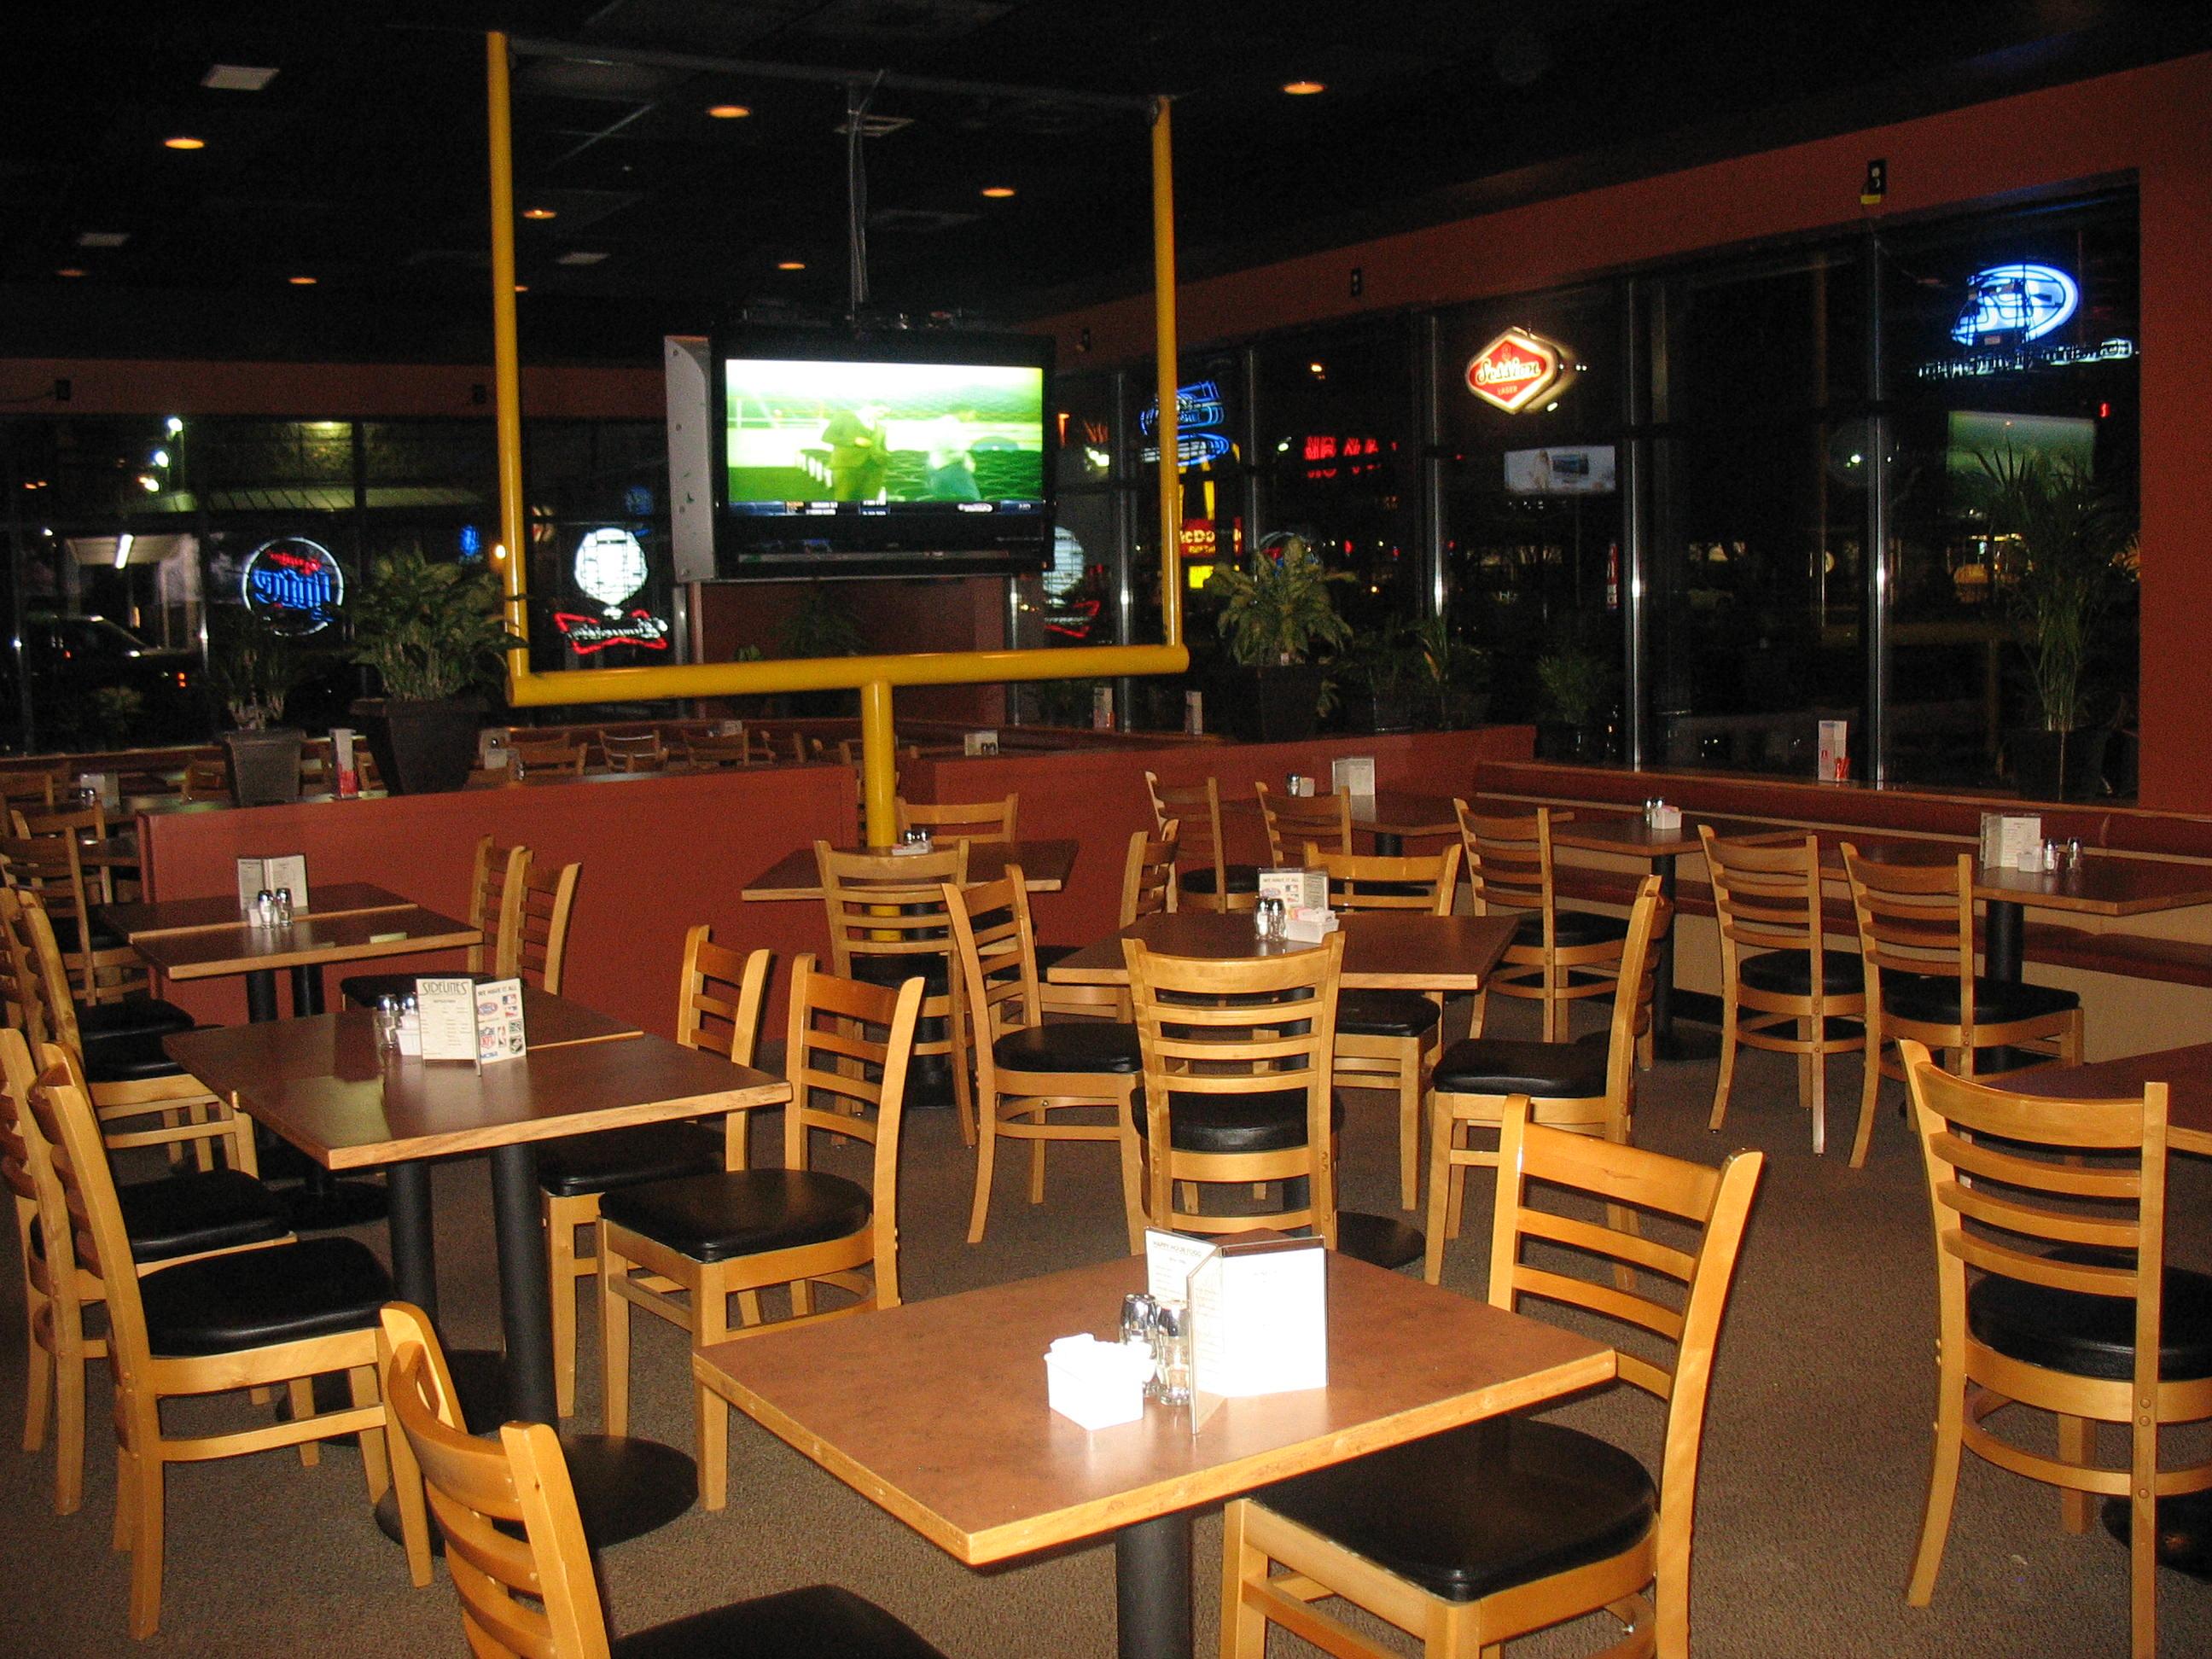 Sports bar restaurants near me sports hd wallpaper for Wallpaper places near me